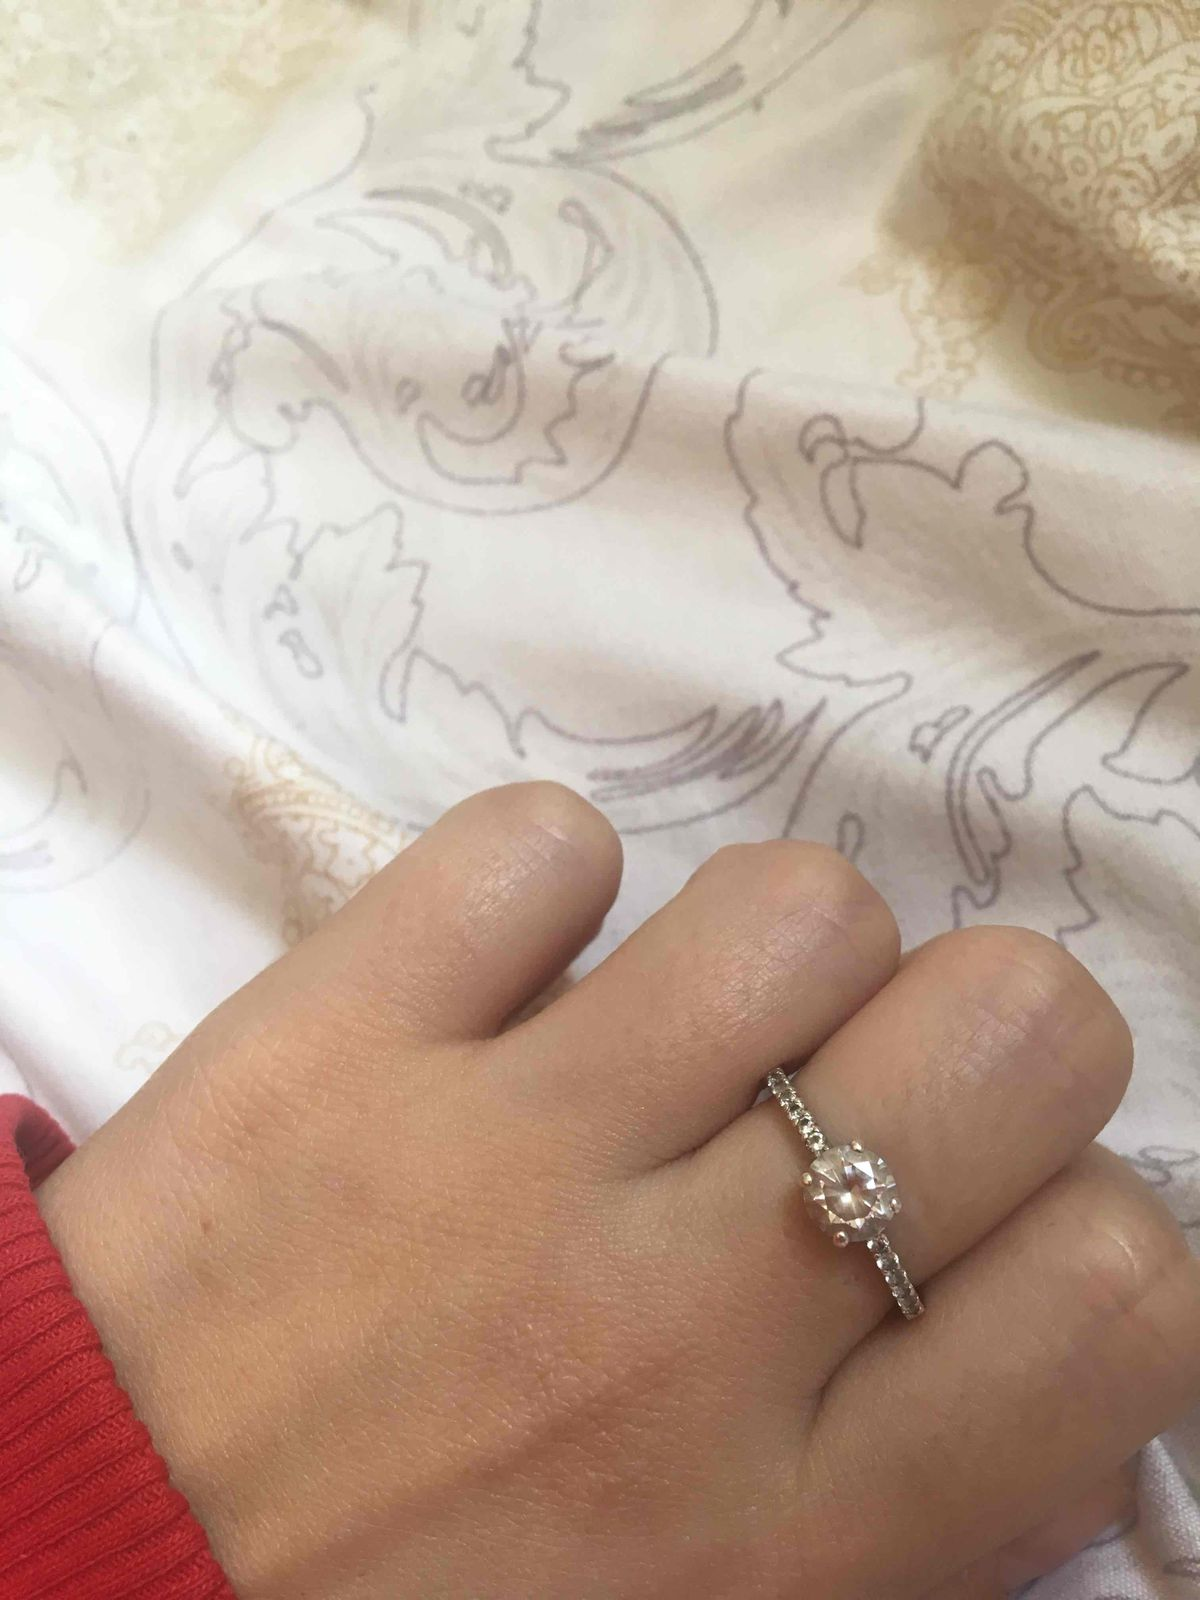 Кольцо с камешком по середине